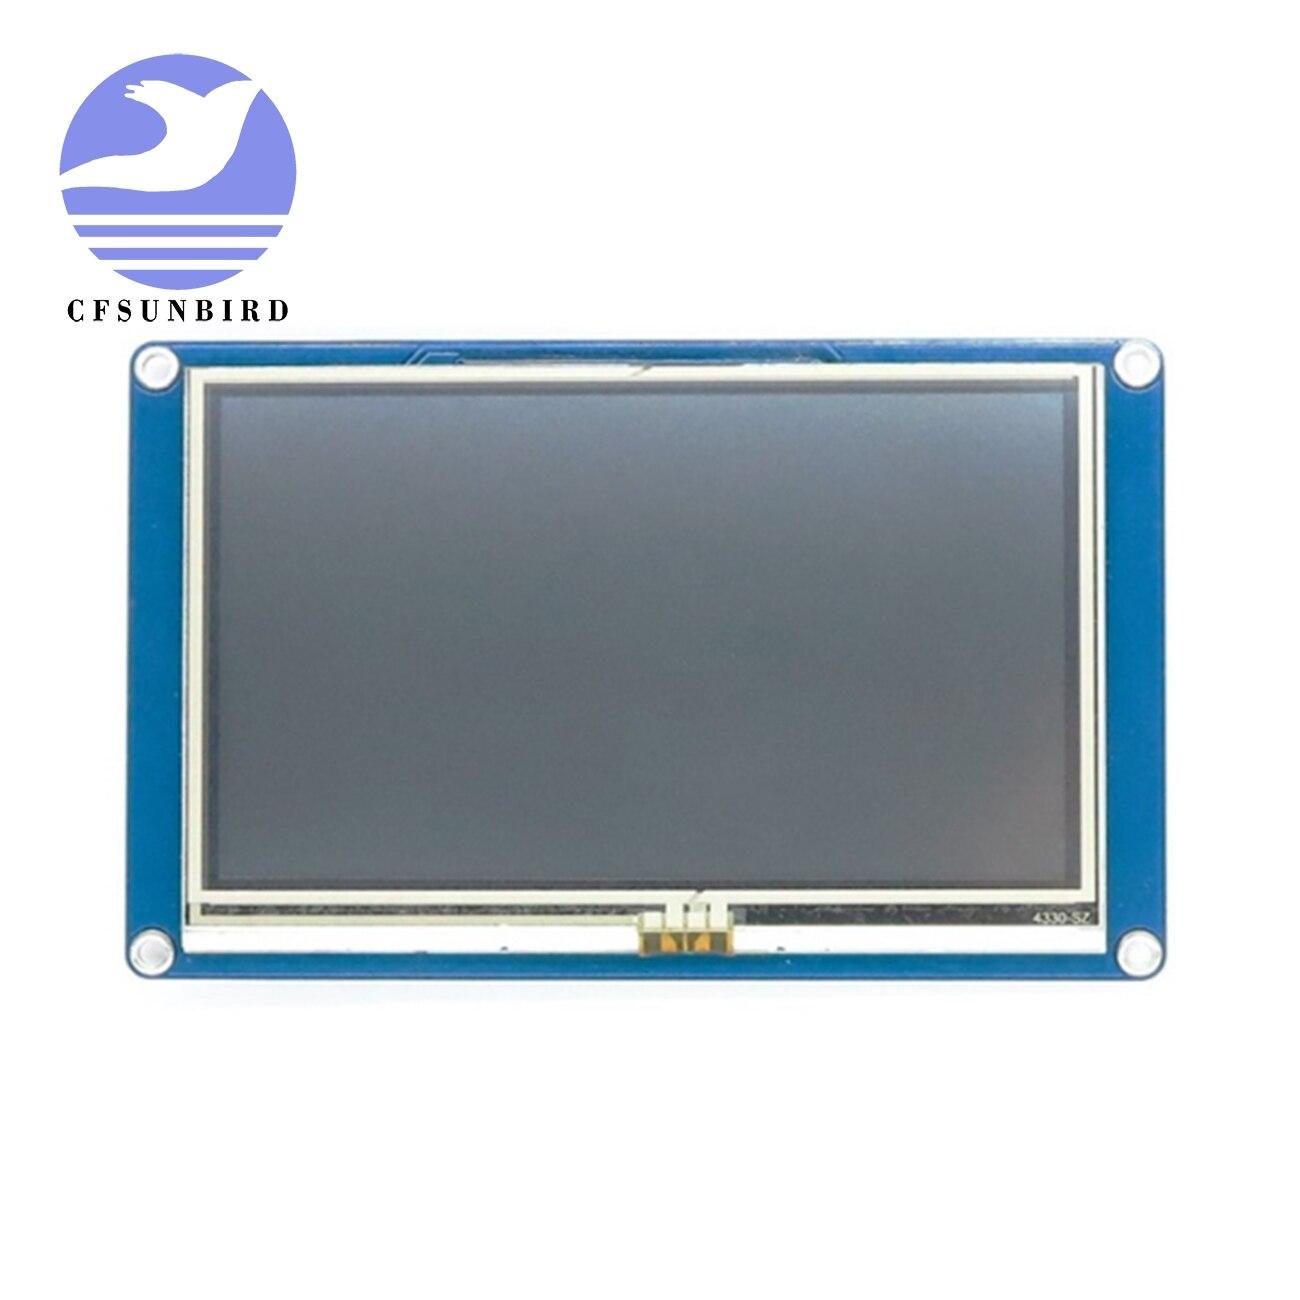 Cfsunbird nextion 4.3 module module hmi tft painel de toque módulo display lcd raspberry pi esp8266 nx4827t043